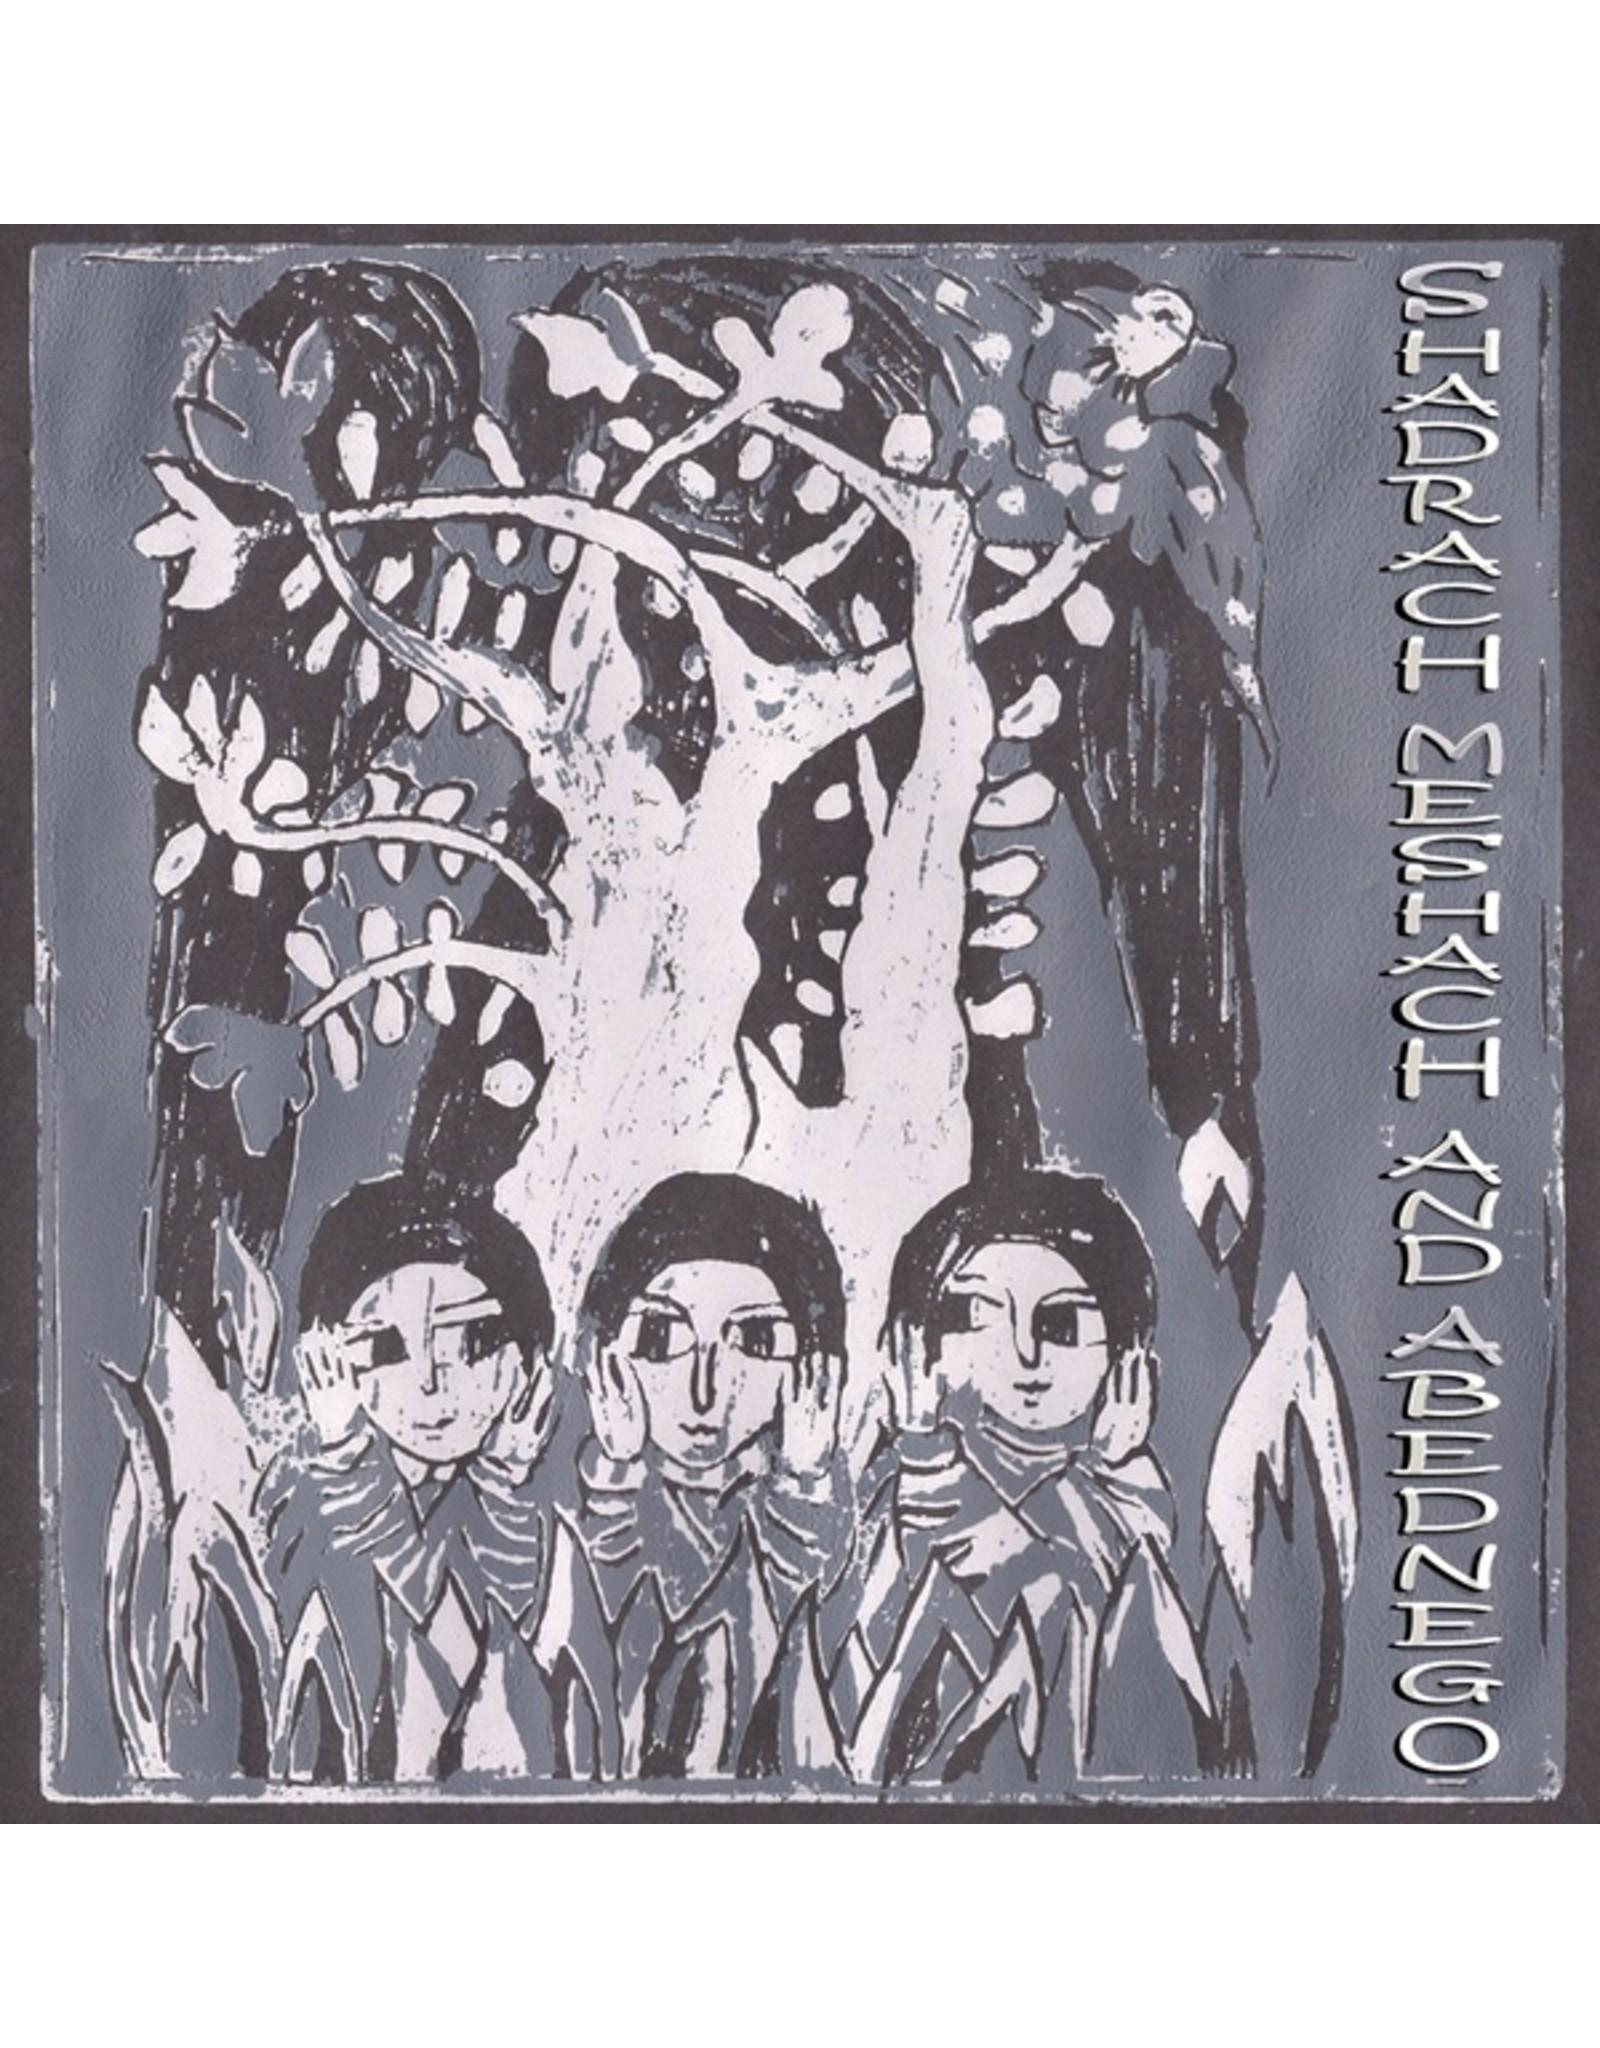 New Vinyl Alpha & Omega - Shadrach, Meshach And Abednego LP